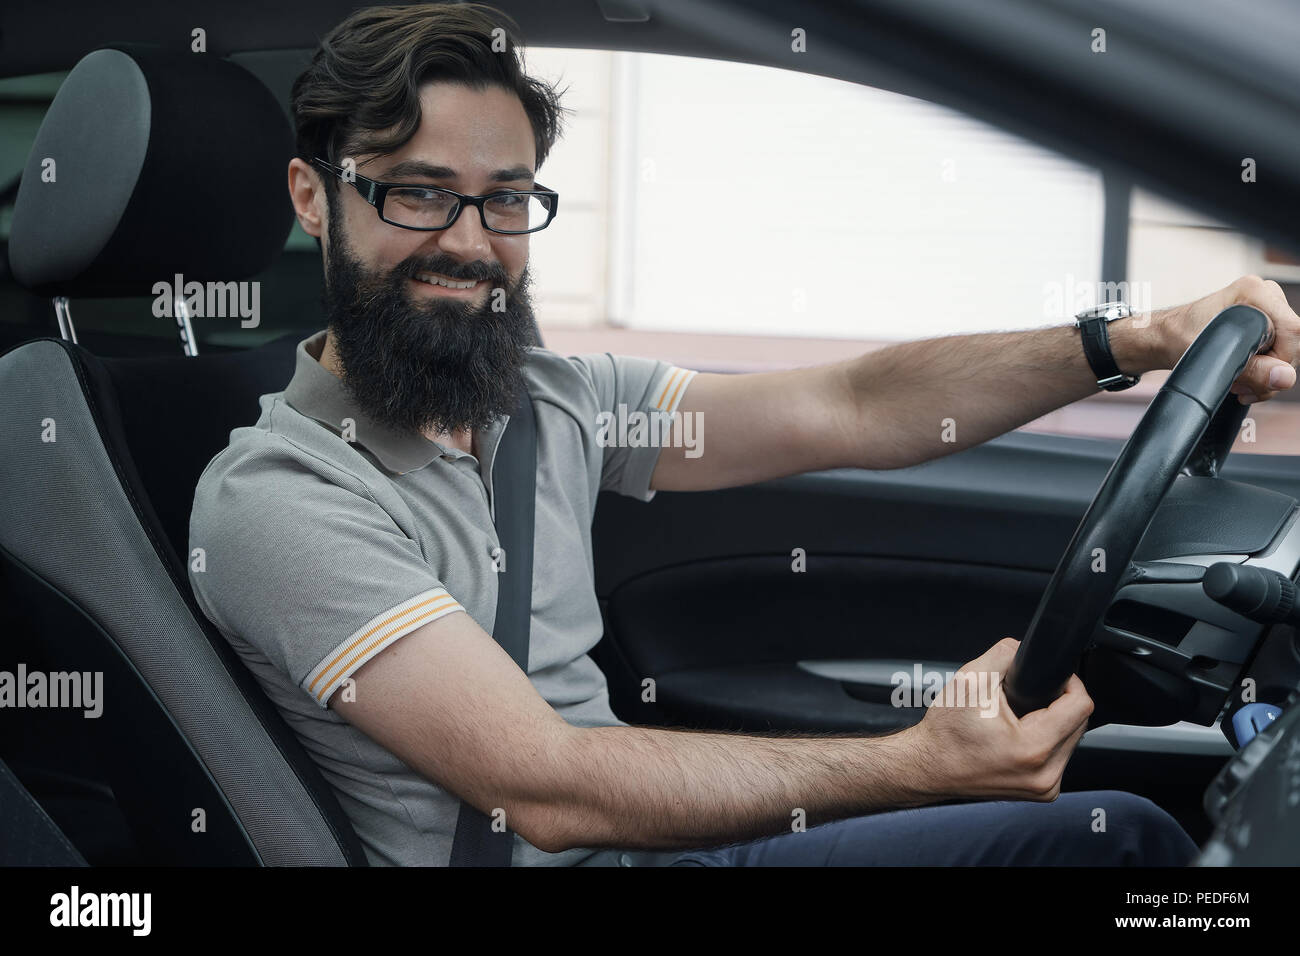 2932x2932 Pubg Android Game 4k Ipad Pro Retina Display Hd: Fastened The Seatbelt Stock Photos & Fastened The Seatbelt